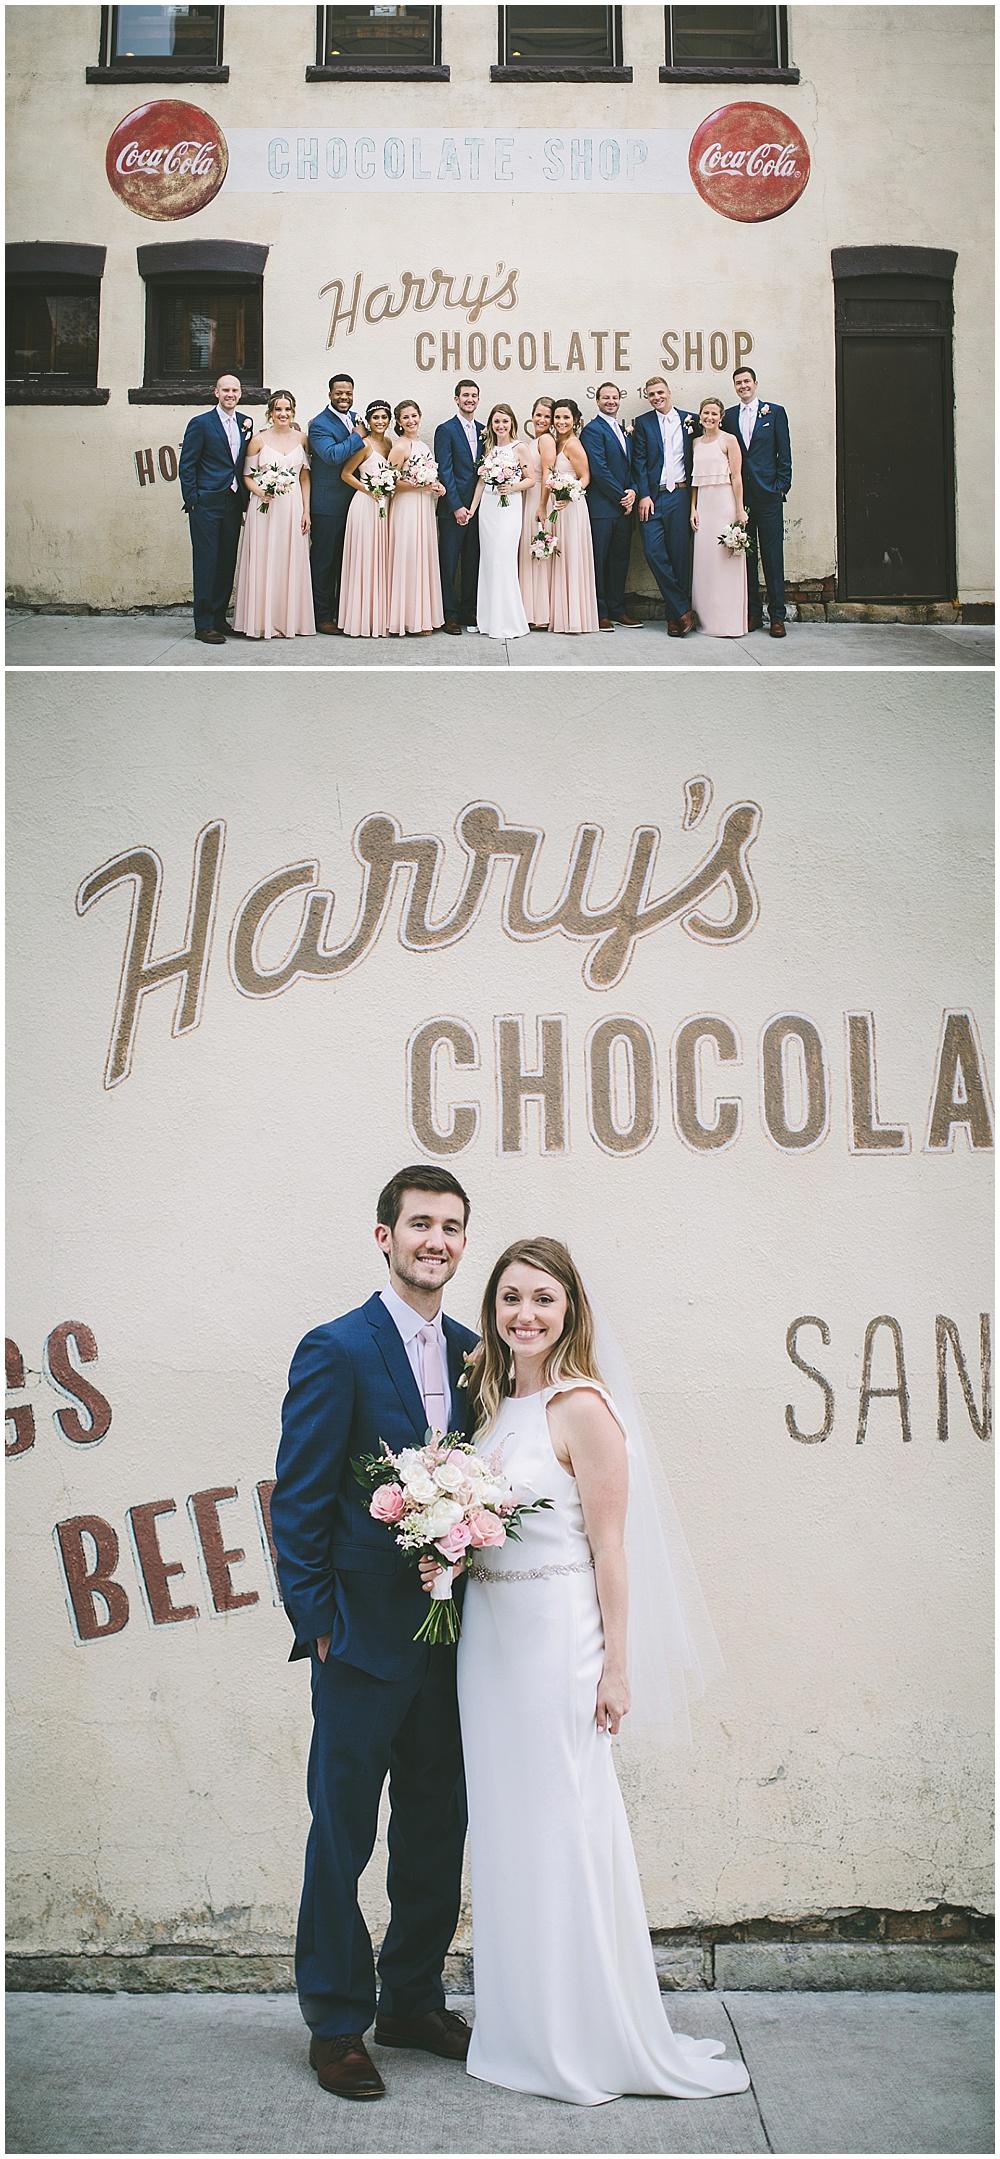 A garden-inspired Purdue University wedding | Purdue alumni wedding, shively club wedding, boilermaker wedding, blush wedding, harry's chocolate shop, bridal party portraits